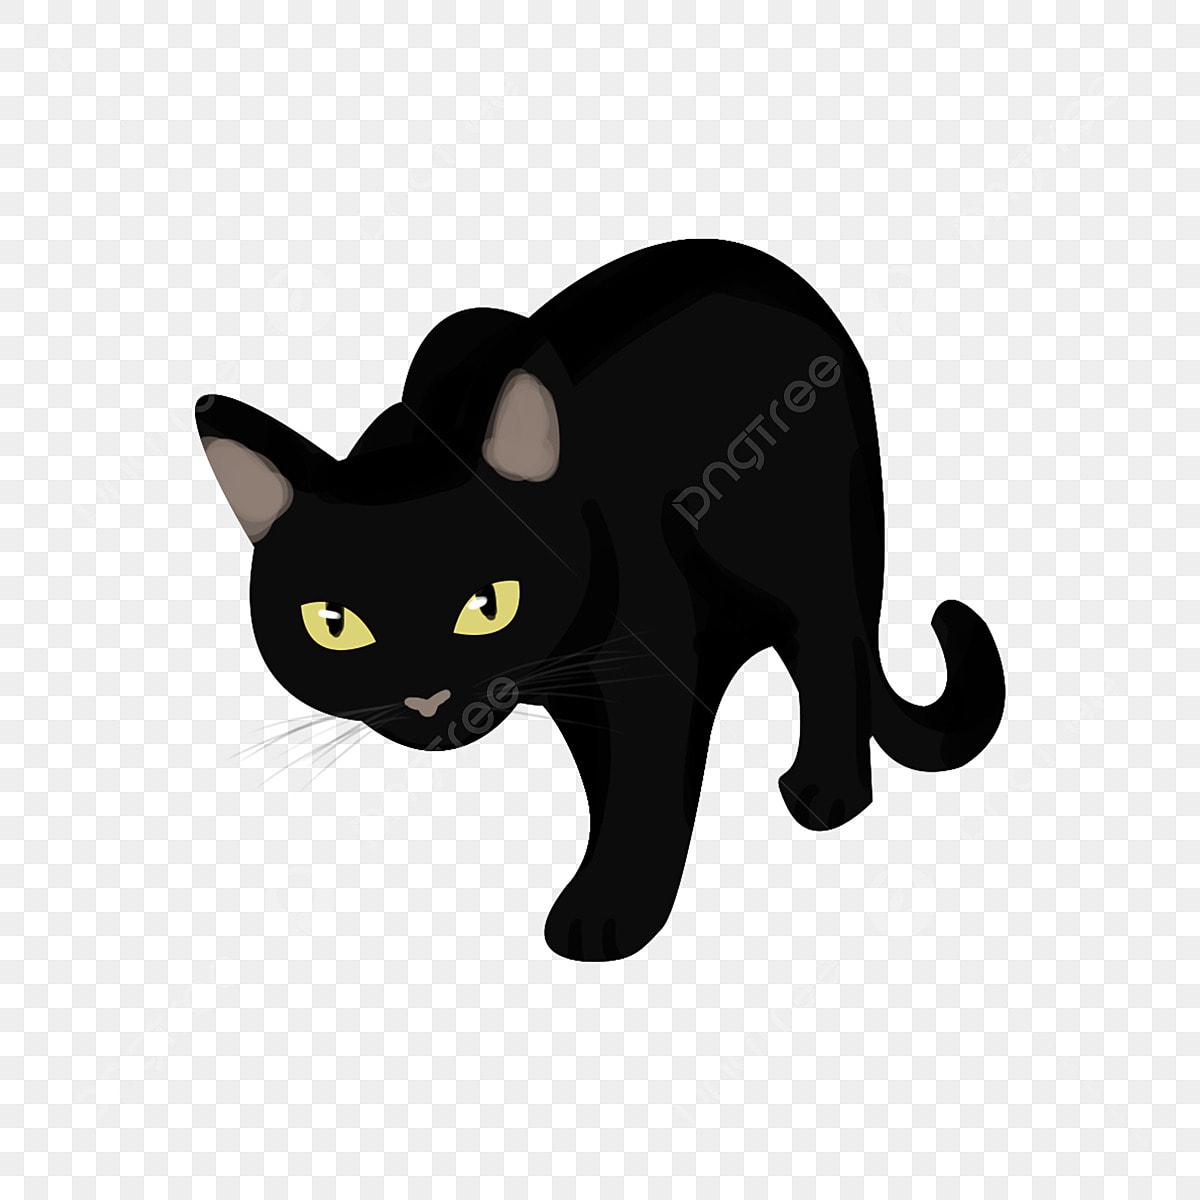 Halloween Tangan Yang Ditarik Kartun Kucing Hitam Elemen